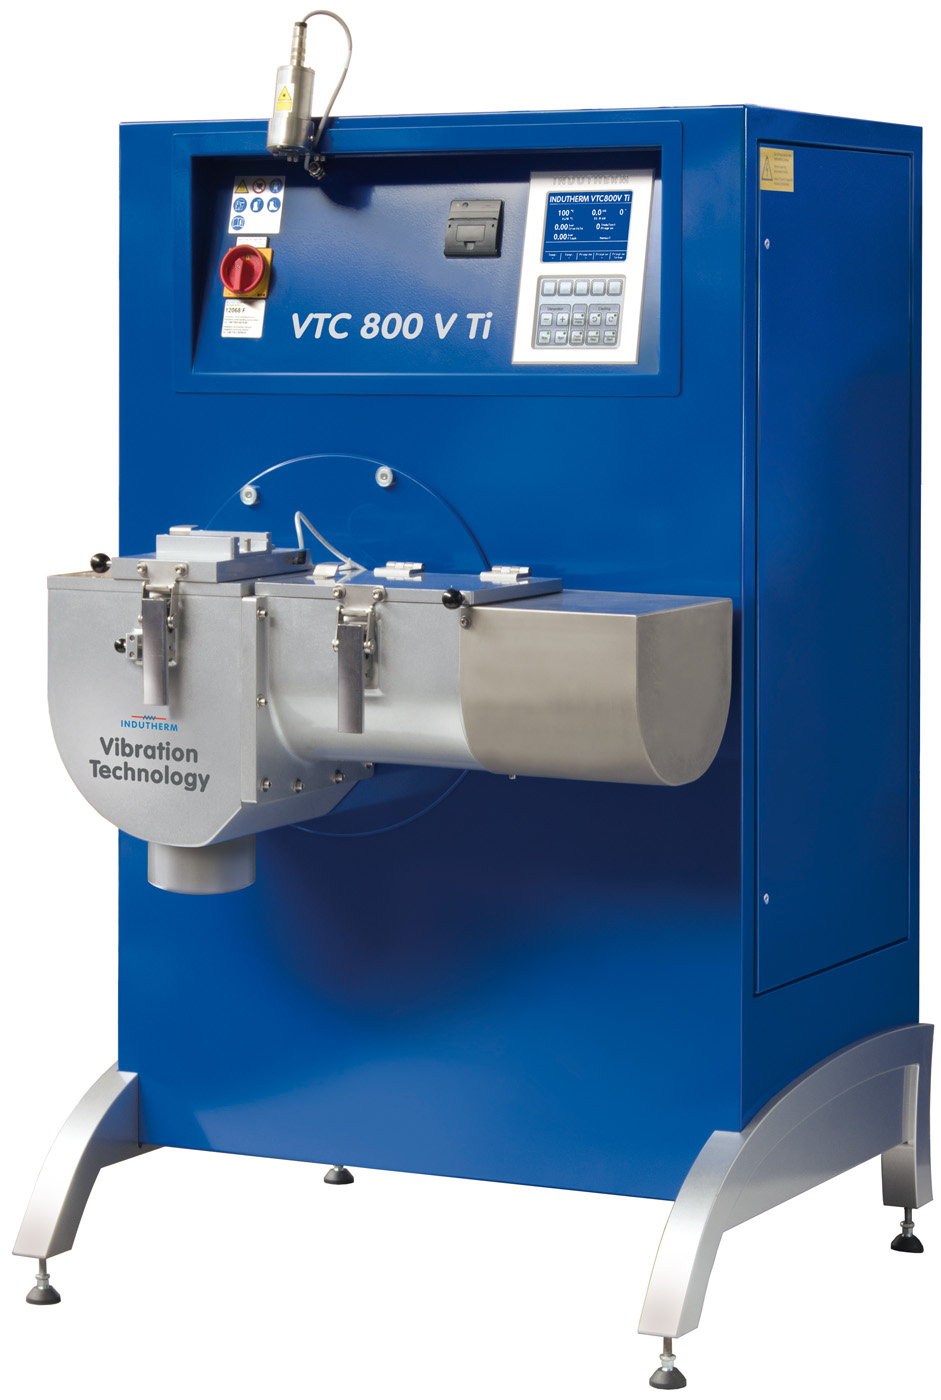 VTC series